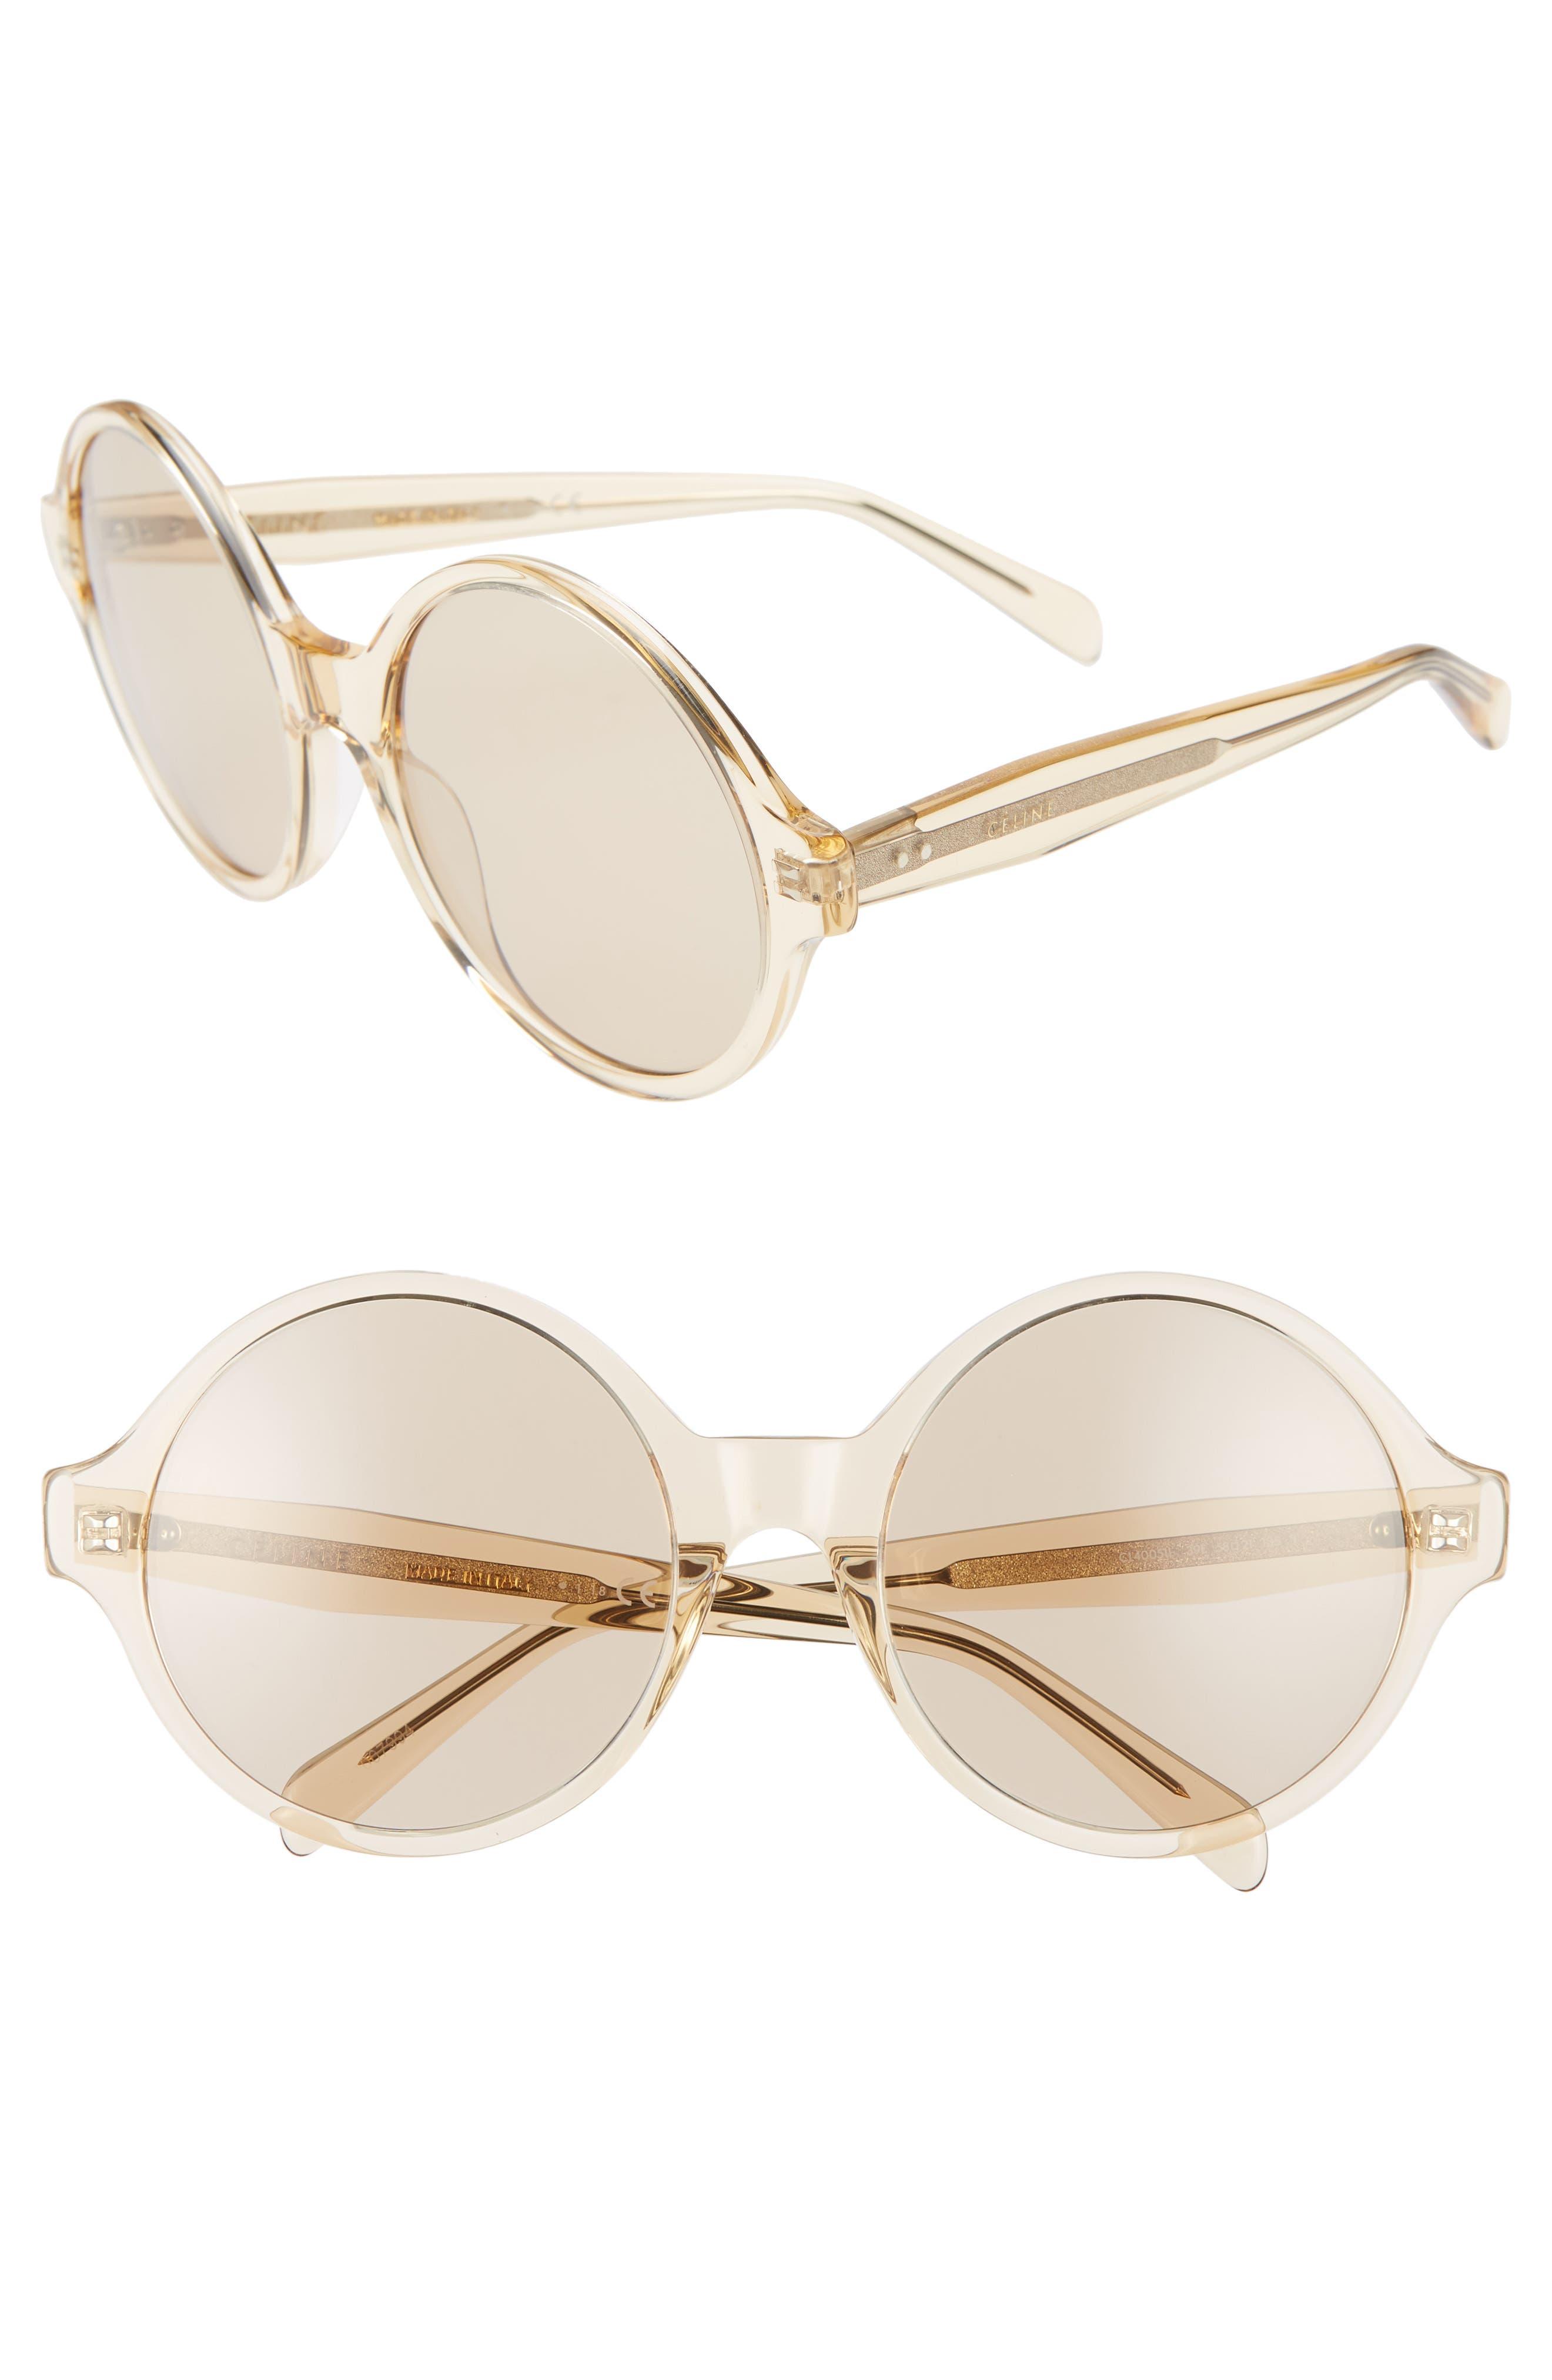 ,                             58mm Round Sunglasses,                             Main thumbnail 1, color,                             TRANSPARENT OCHRE/ LIGHT BROWN